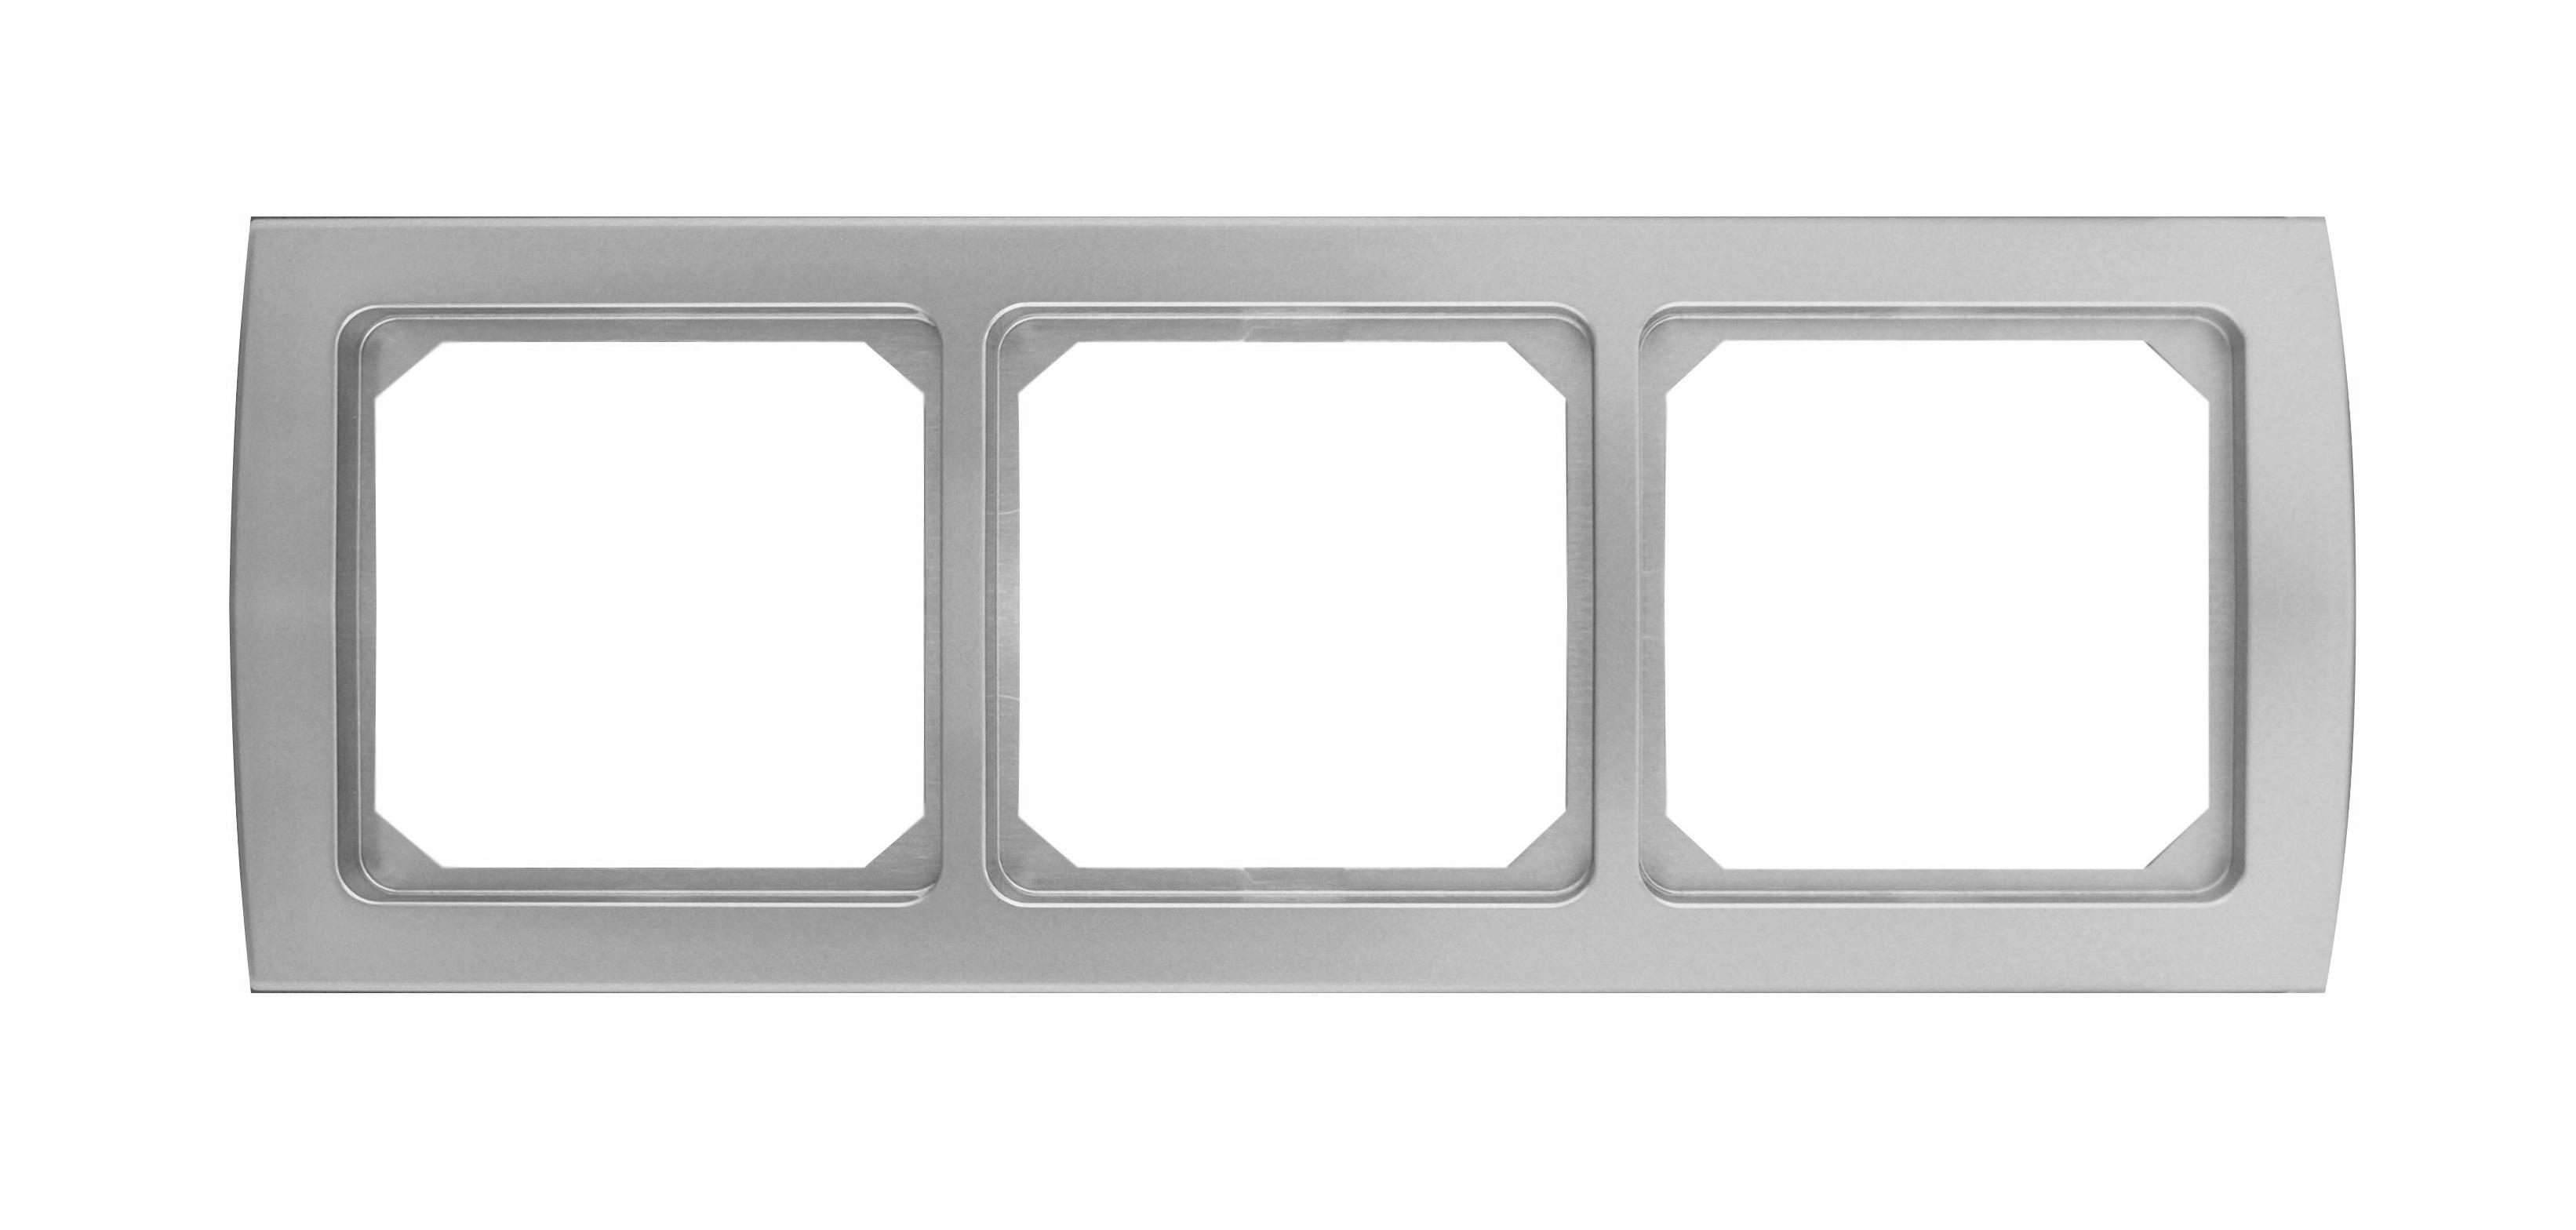 1 Stk Rahmen 3-fach, Edelstahleffekt Riva EL2043211-